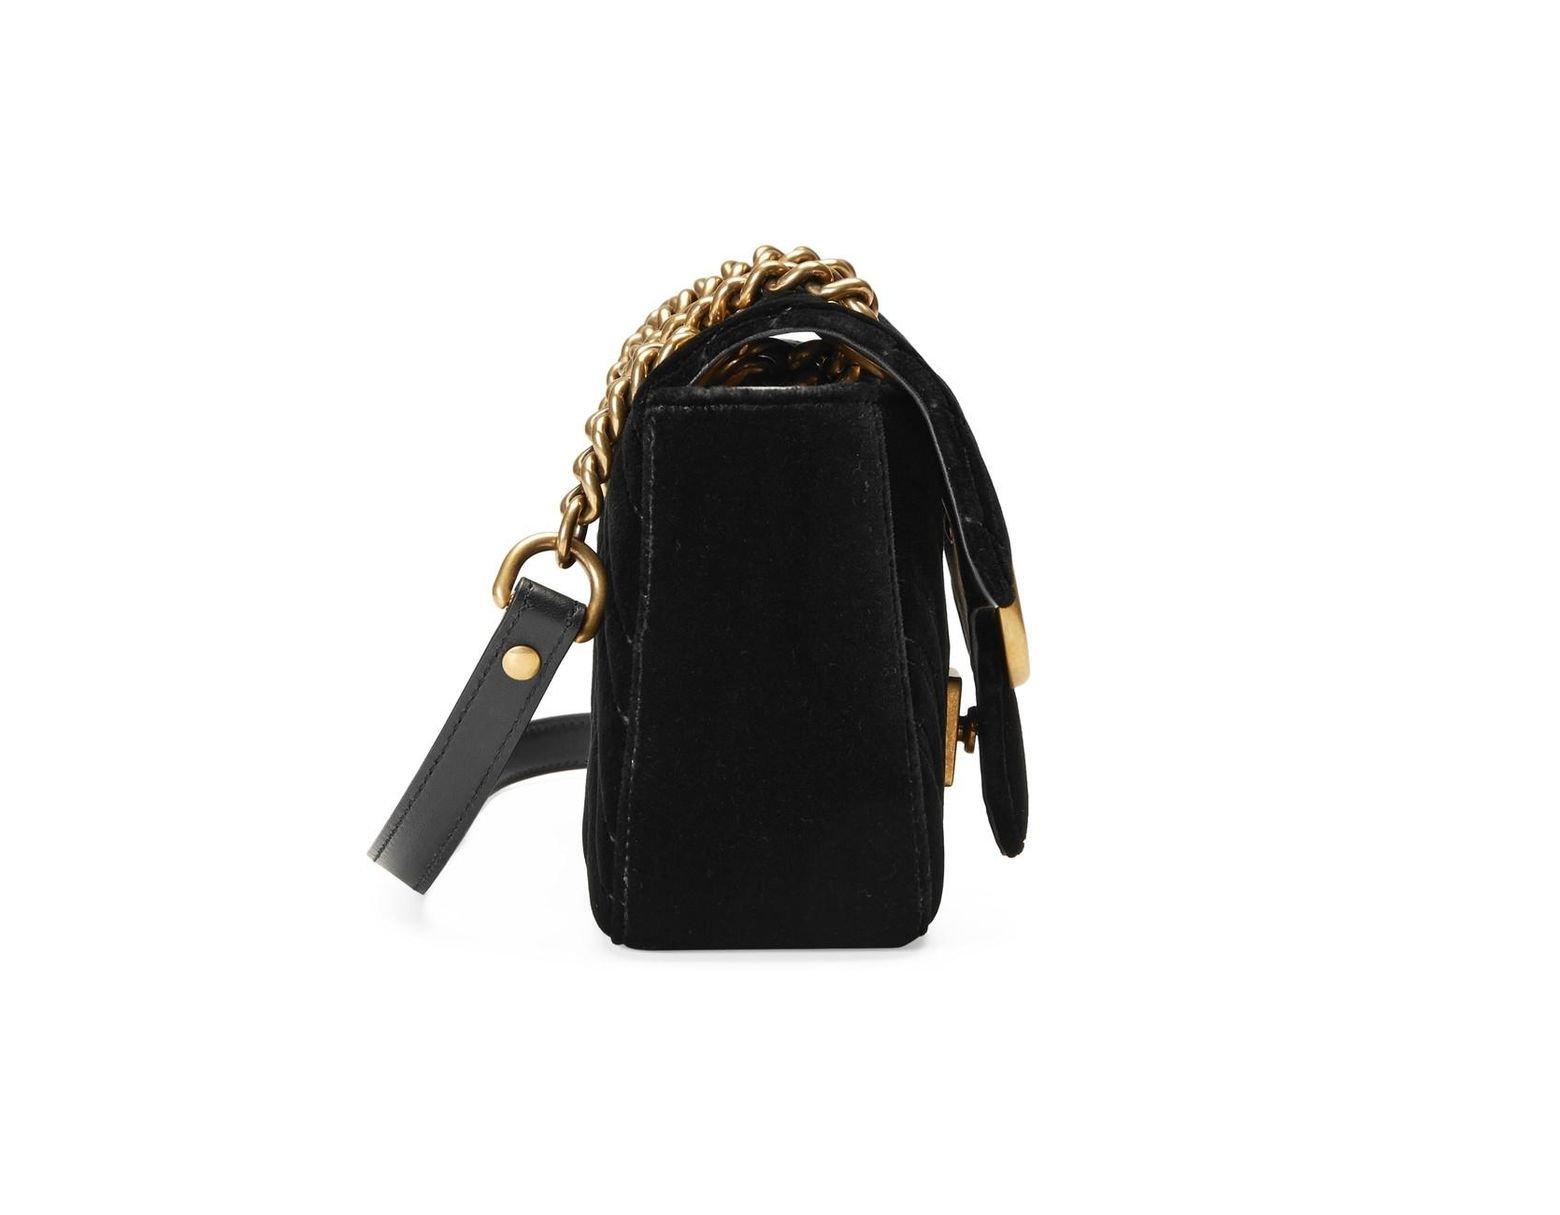 e58e8798e0e7 Gucci GG Marmont Velvet Mini Shoulder Bag in Black - Lyst